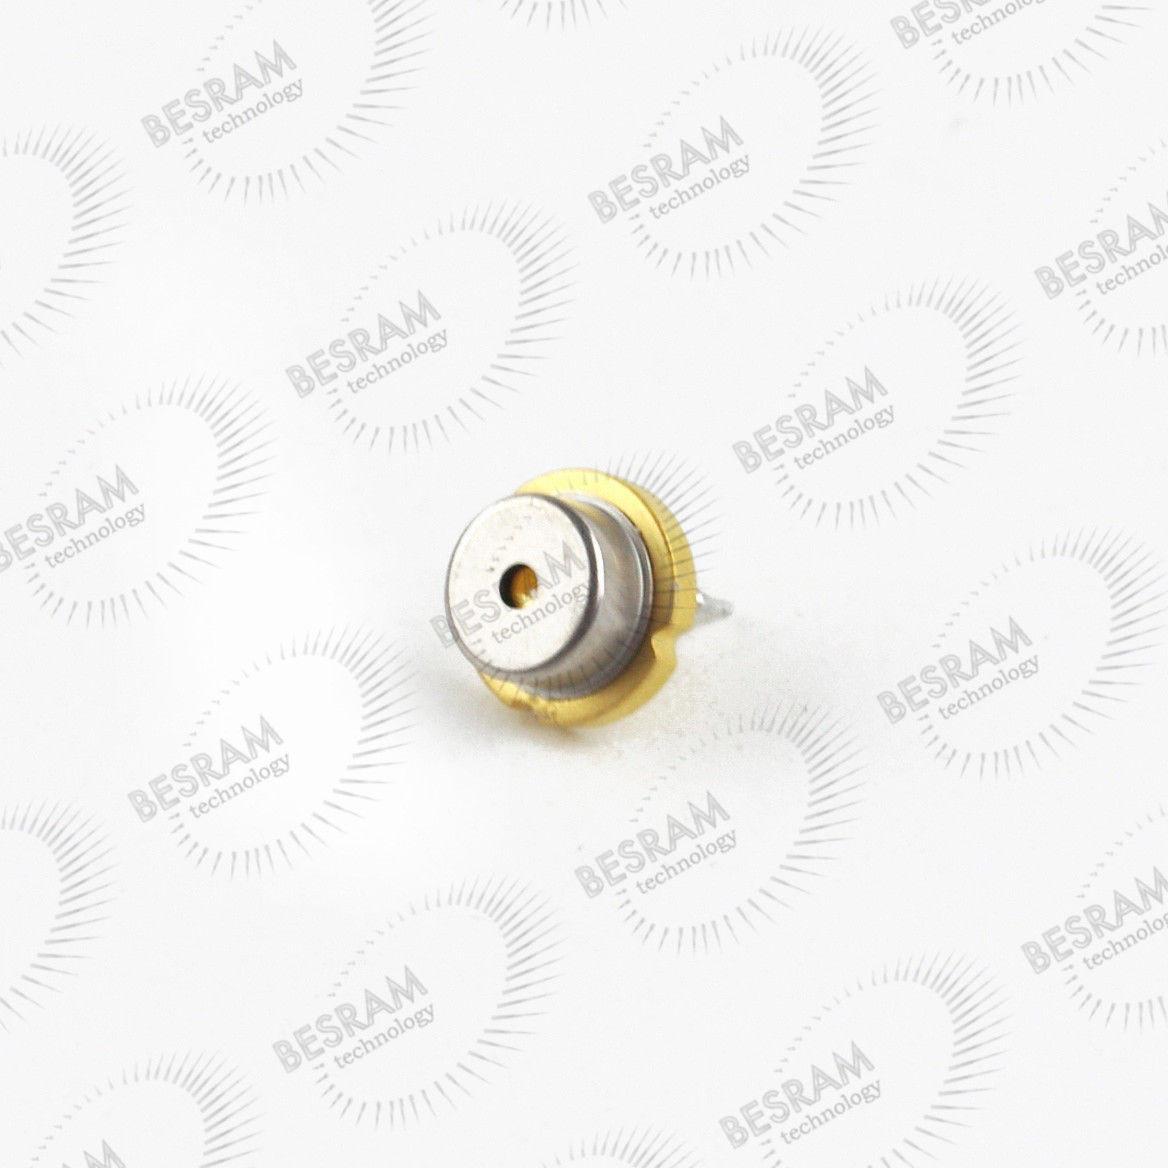 Laserland Opnext Oclaro 1 2w 638nm Laser Diode Ld